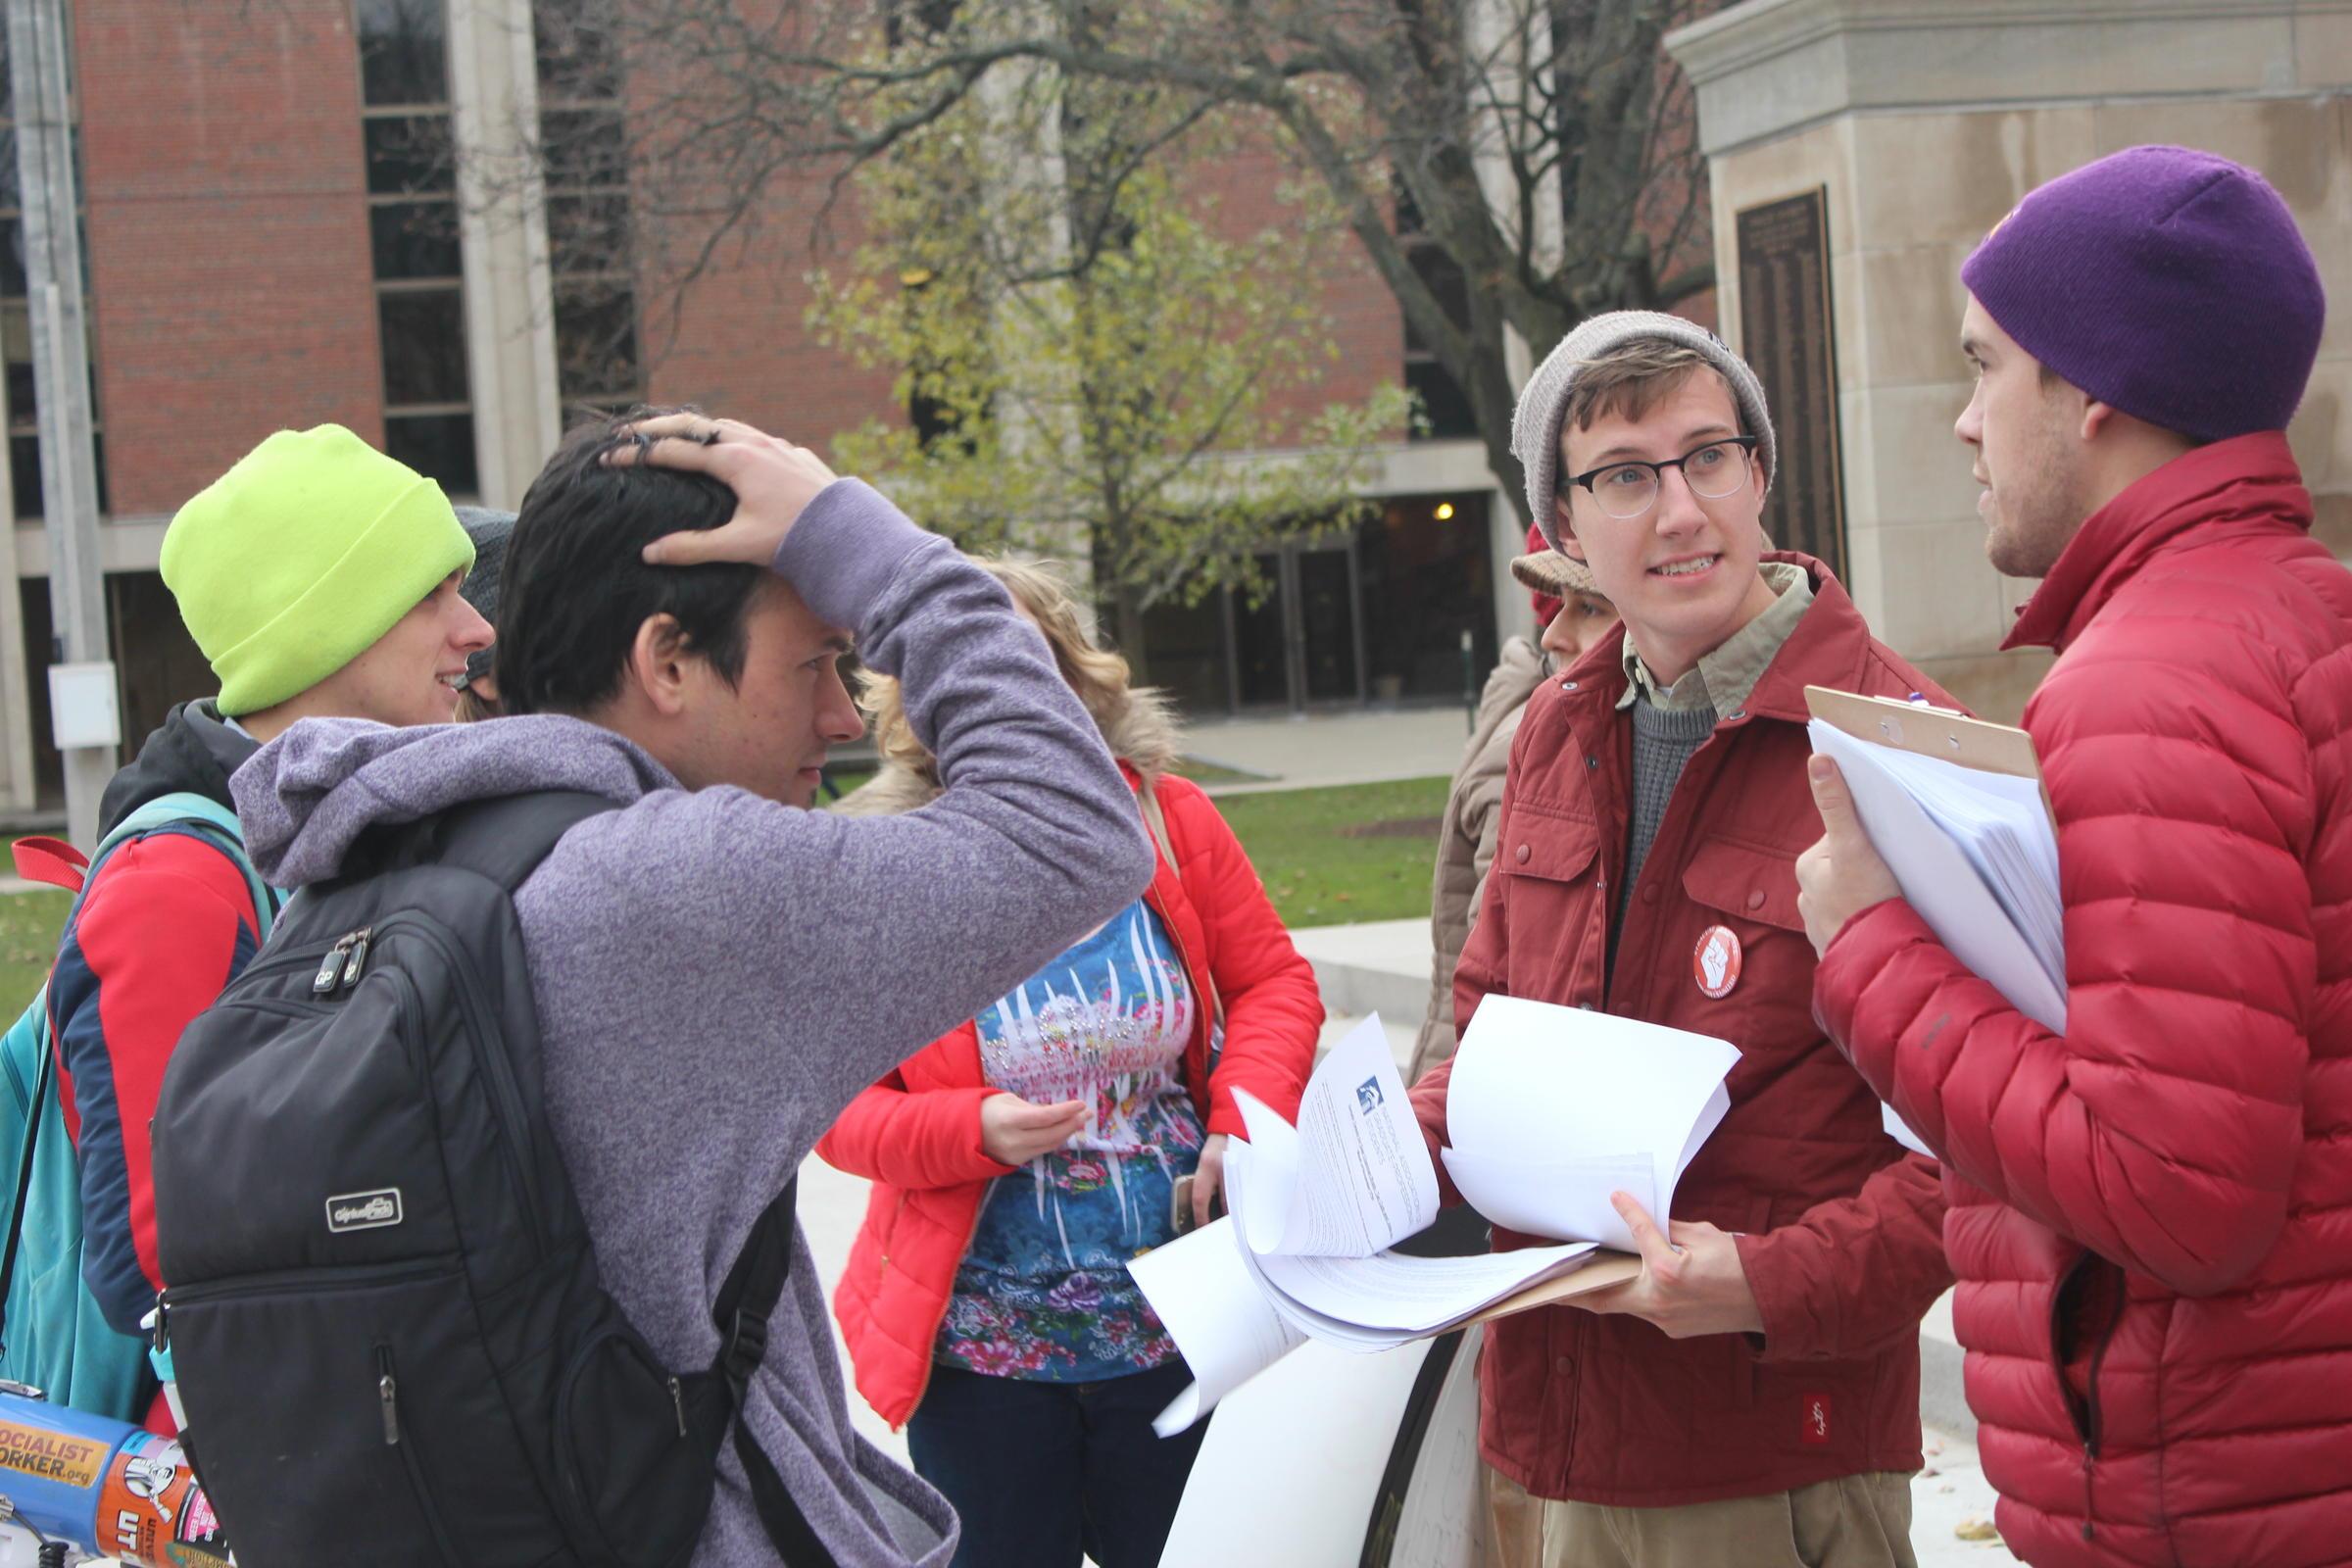 Brandon Daniels talks with other SU students